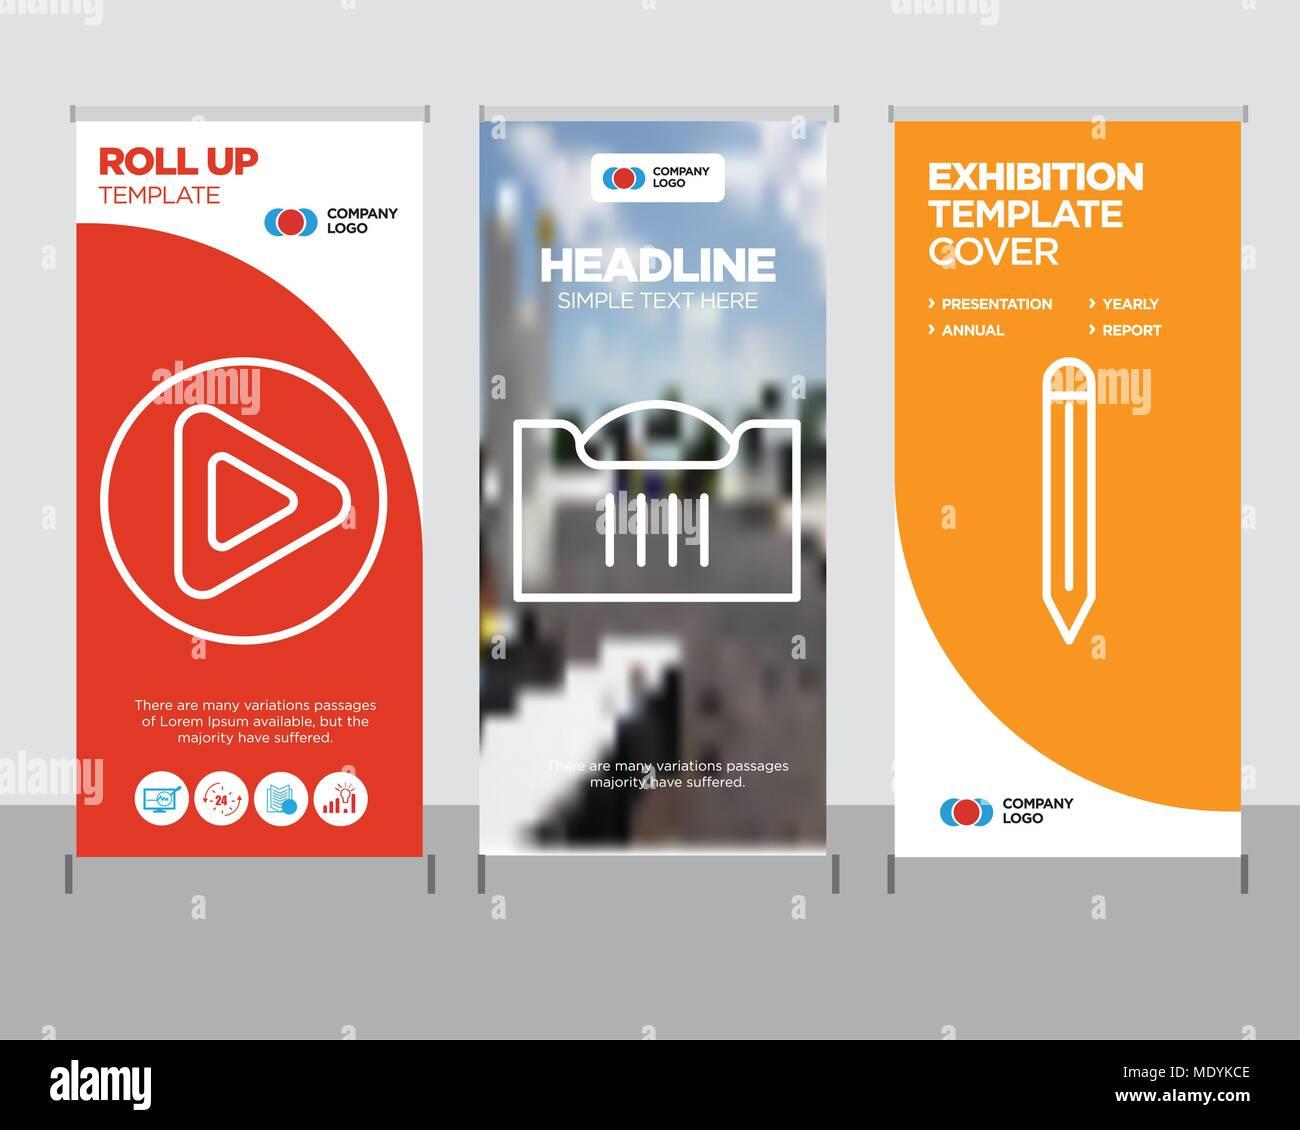 Tolle Online Warenkorb Vorlage Galerie - Entry Level Resume Vorlagen ...